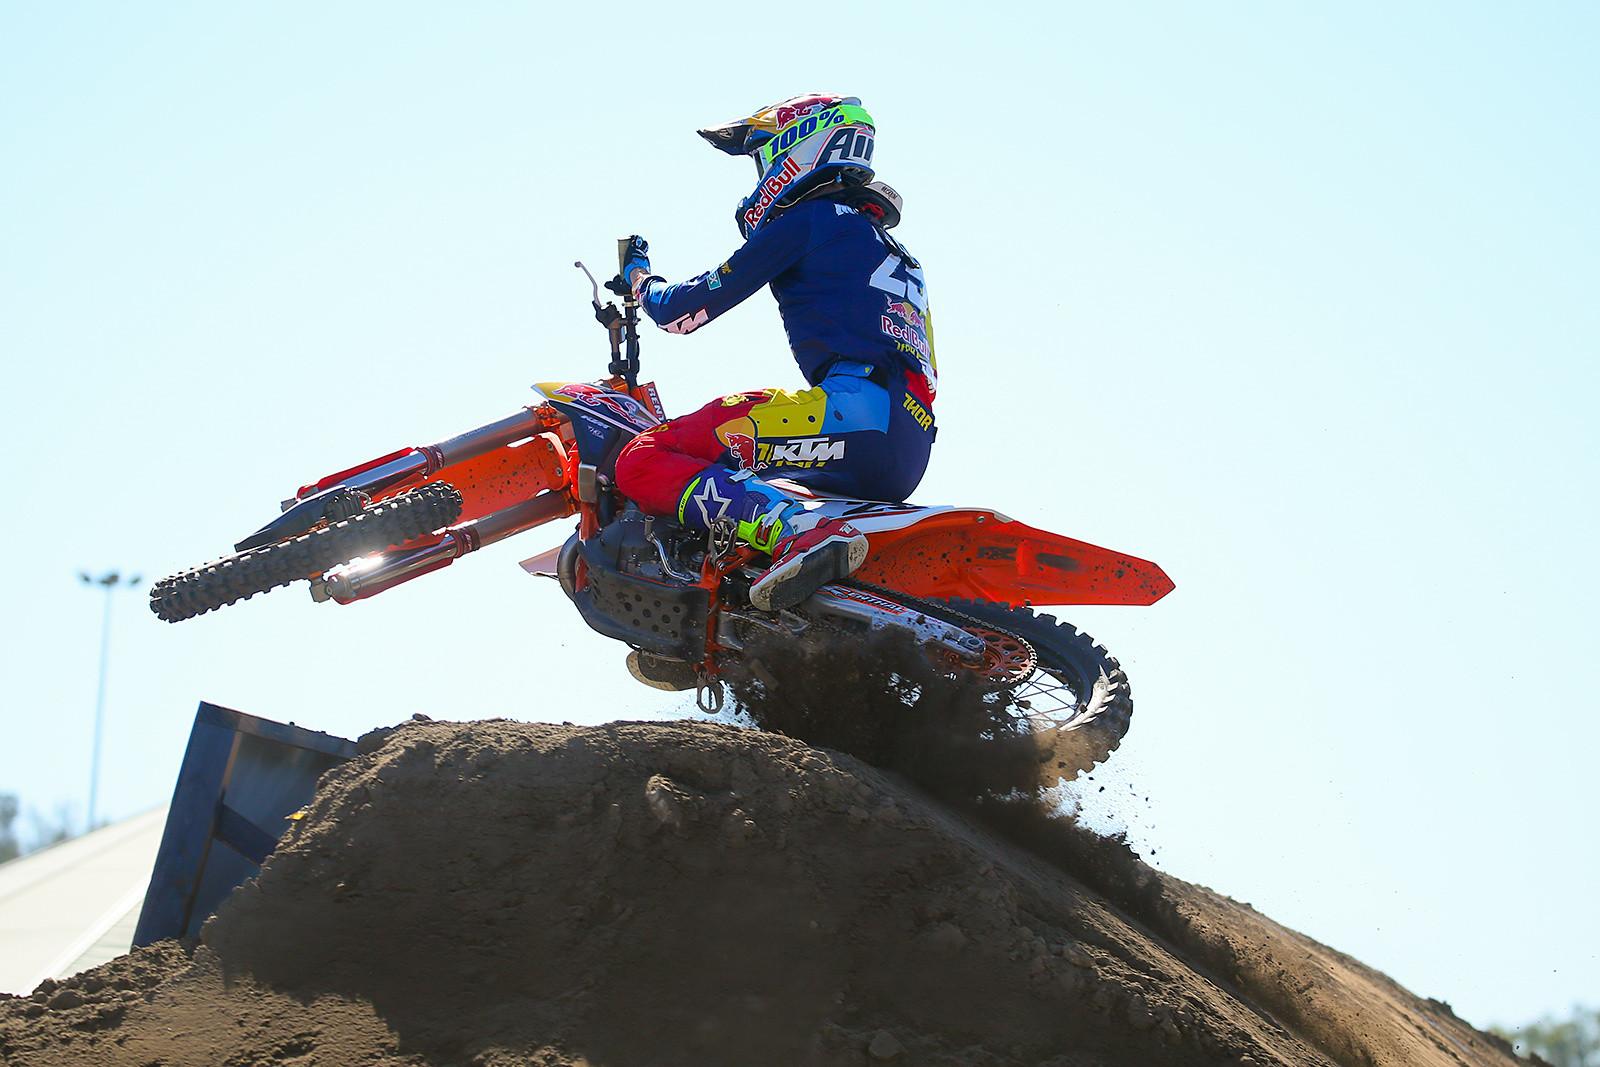 Marvin Musquin - Photo Blast: Red Bull Straight Rhythm - Motocross Pictures - Vital MX